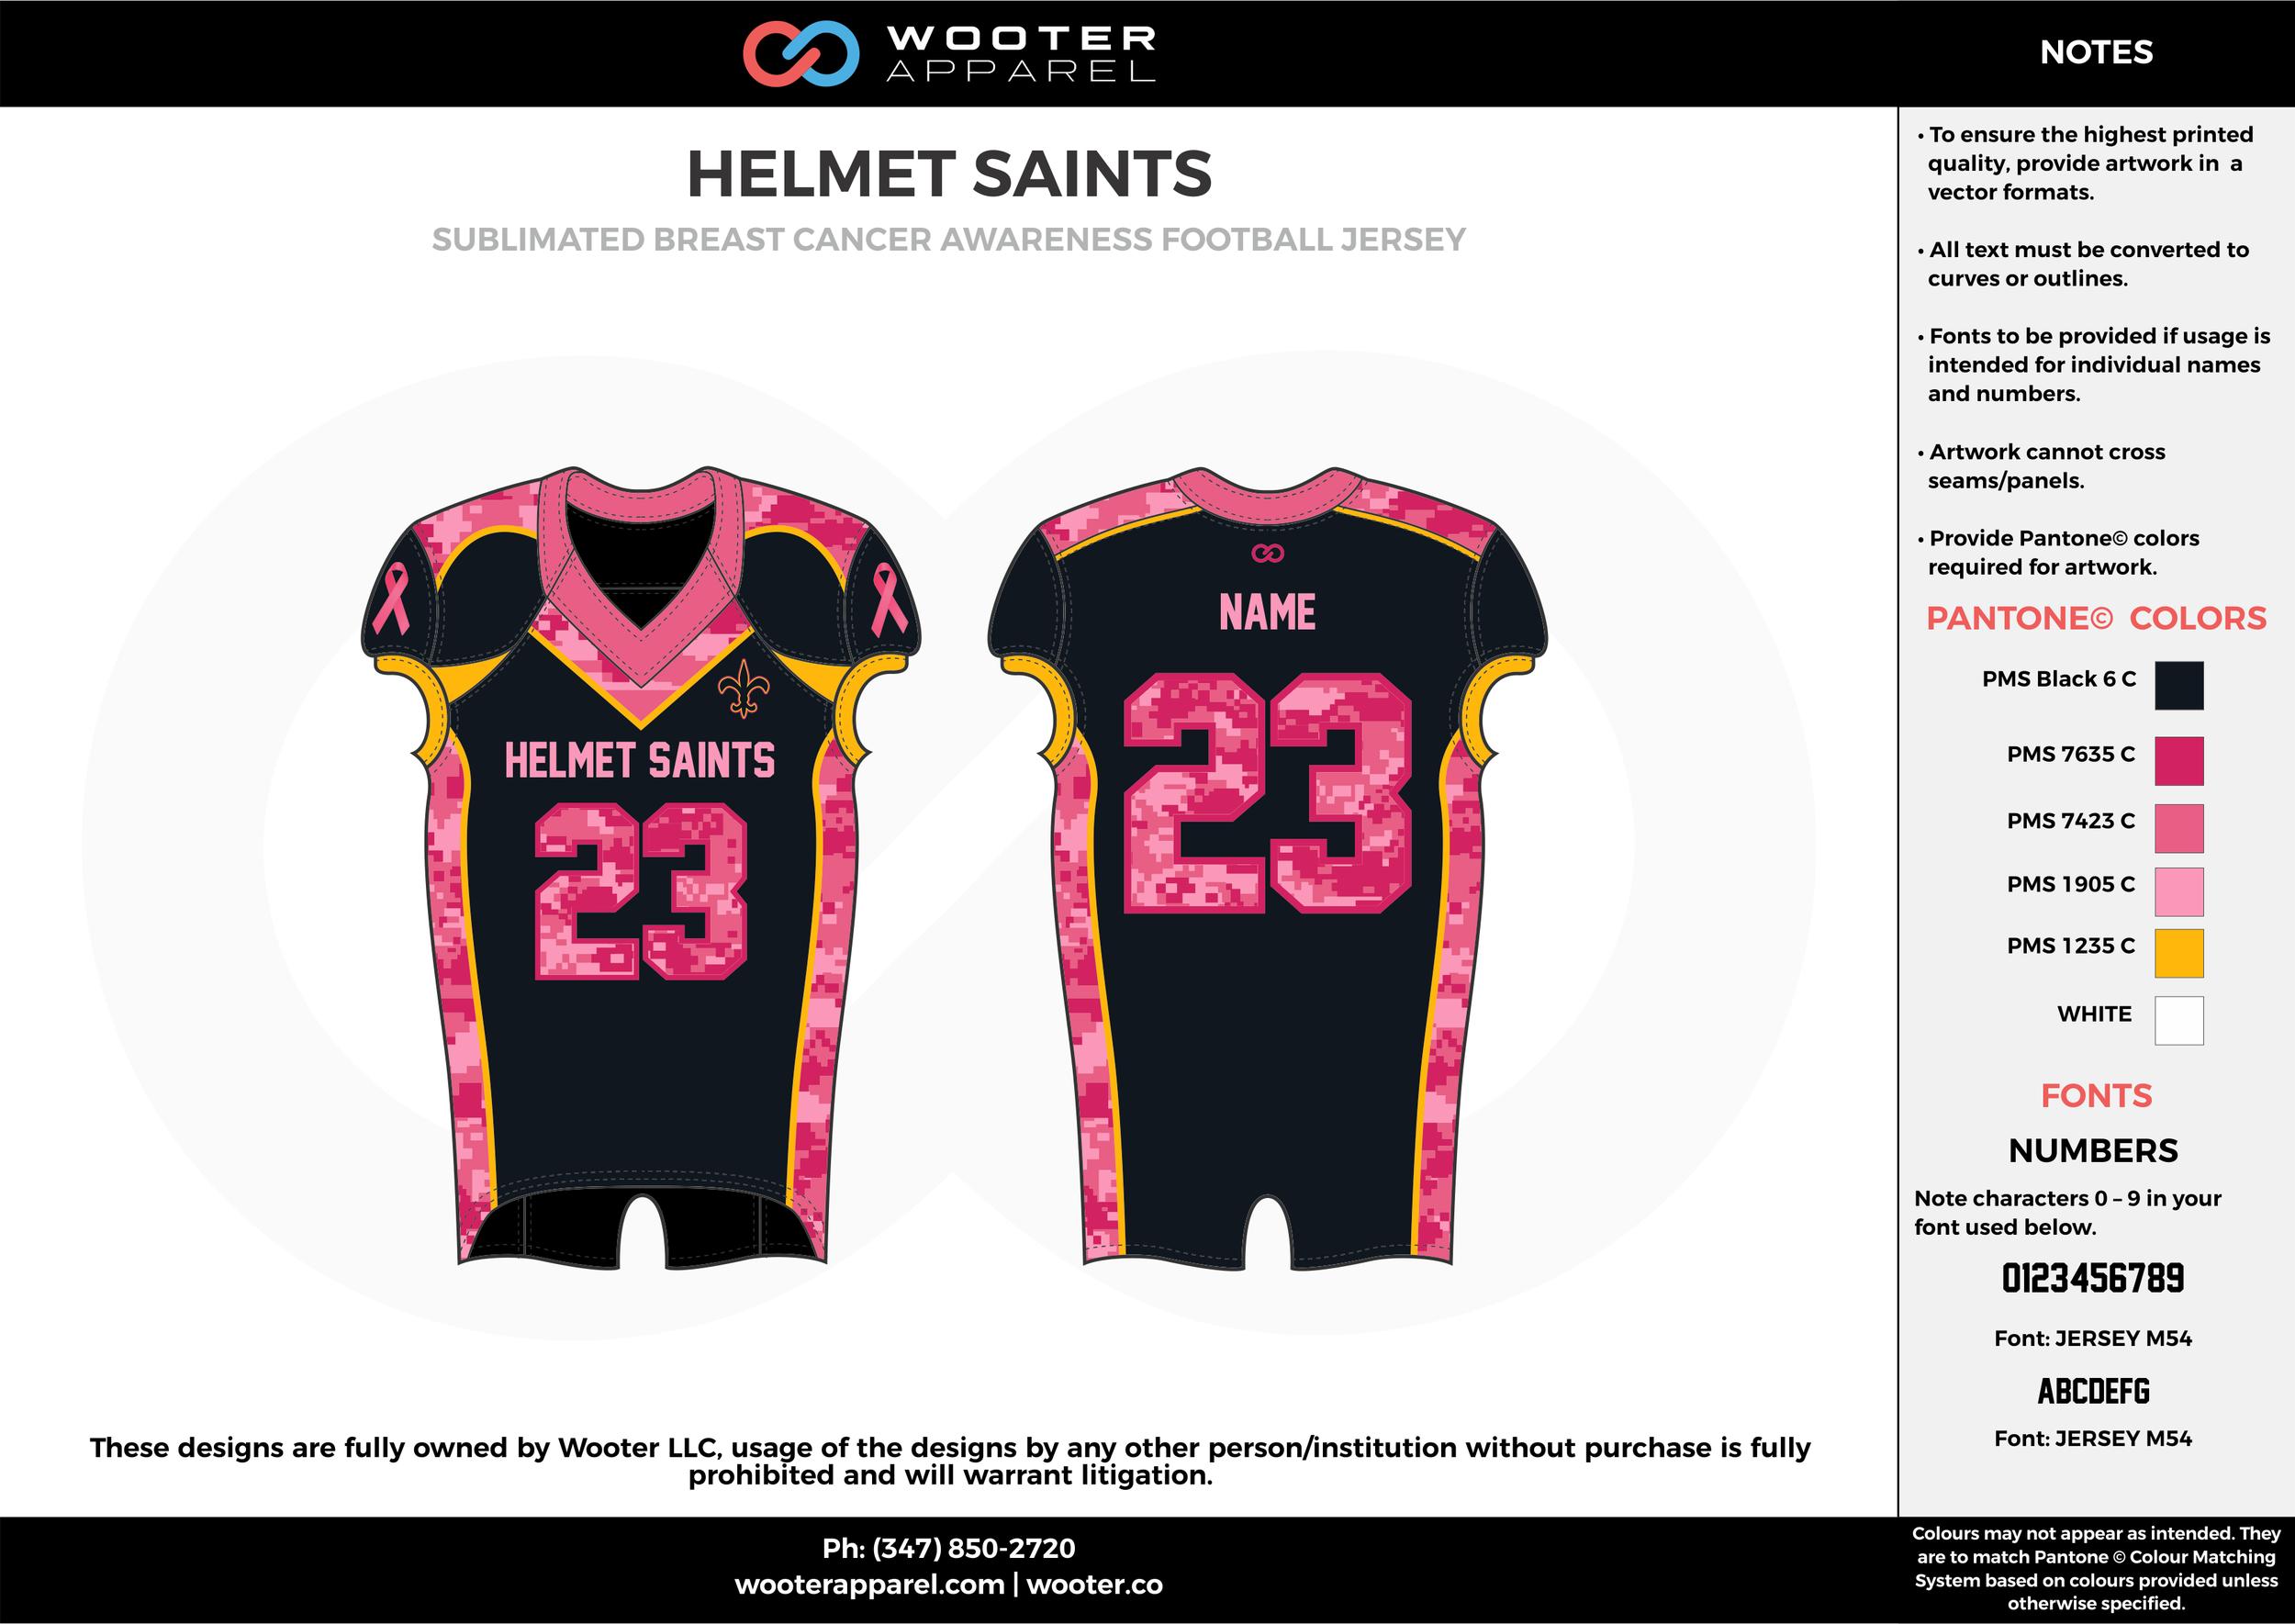 HELMET SAINTS pink black yellow football uniforms jerseys top